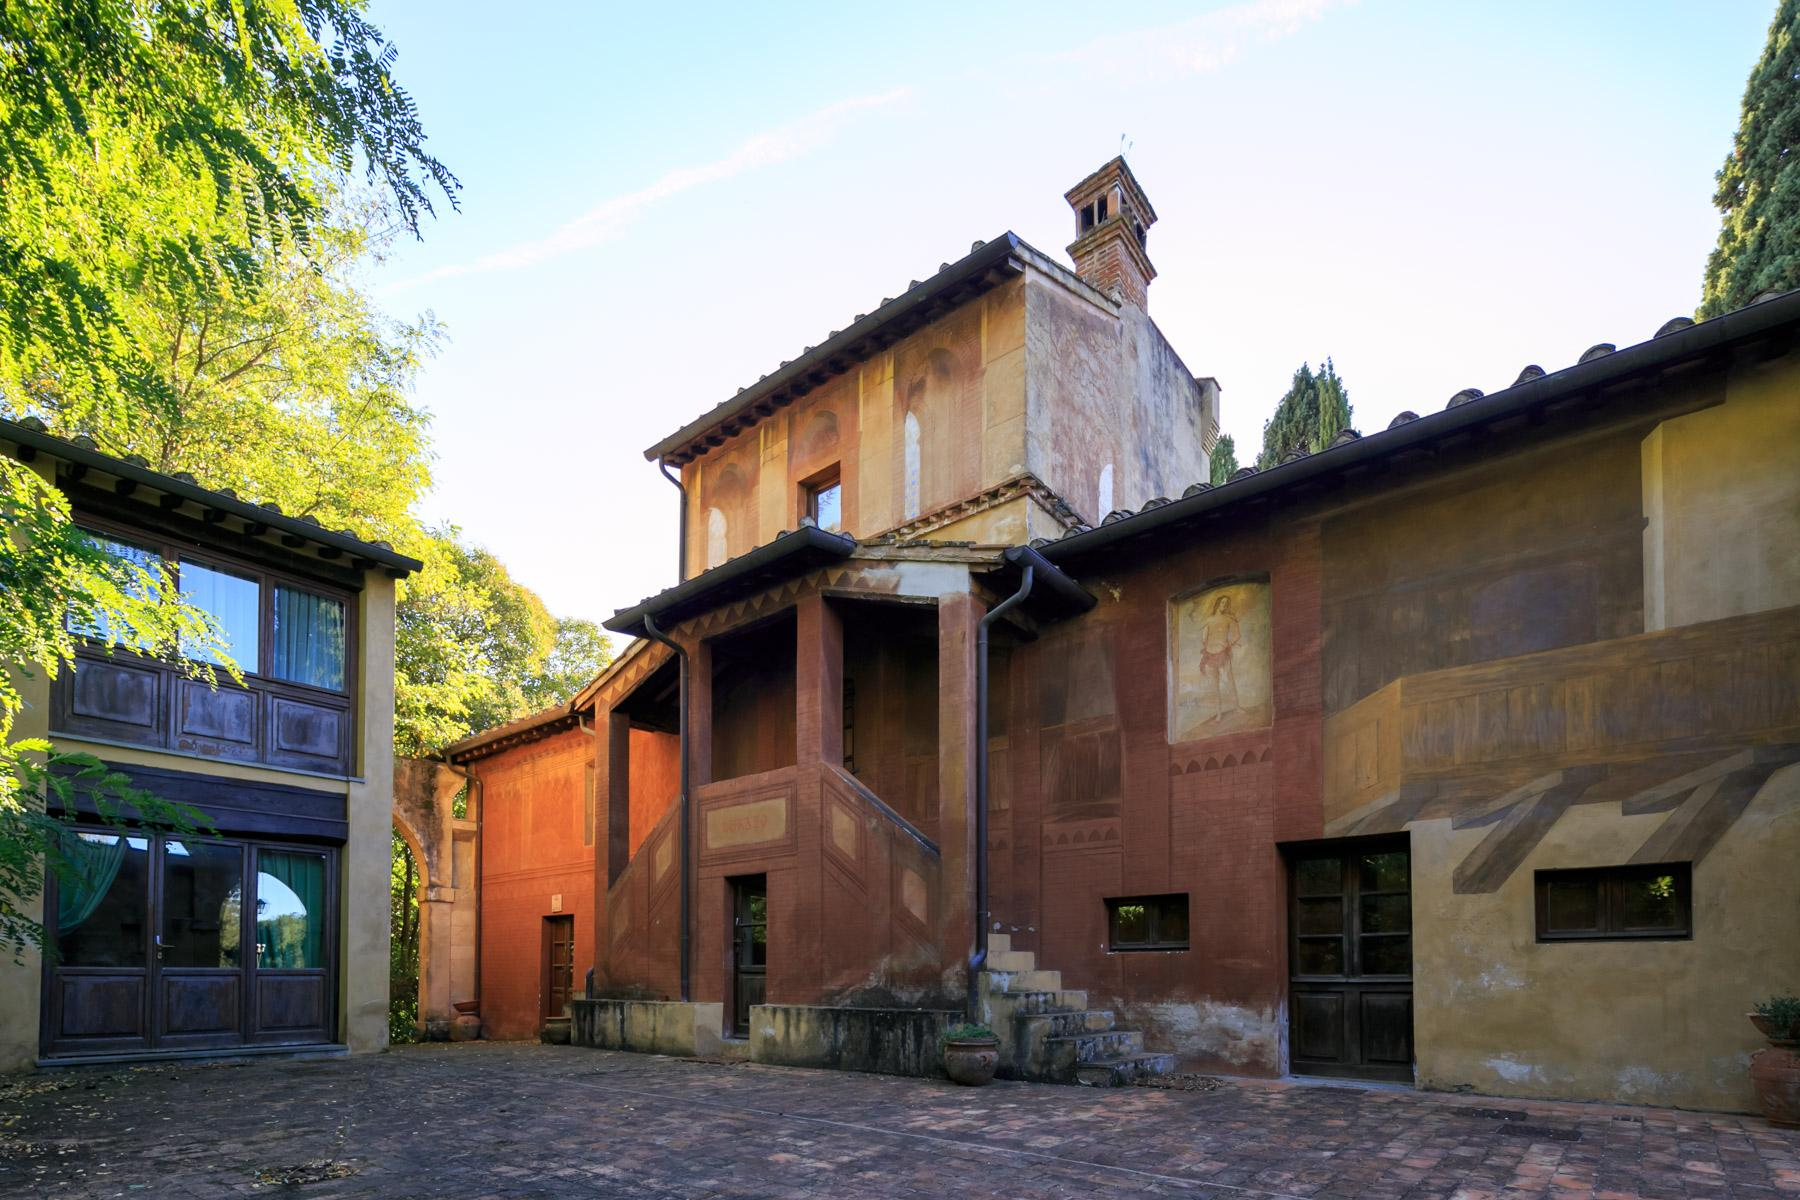 Exquisite 16th century property - 26